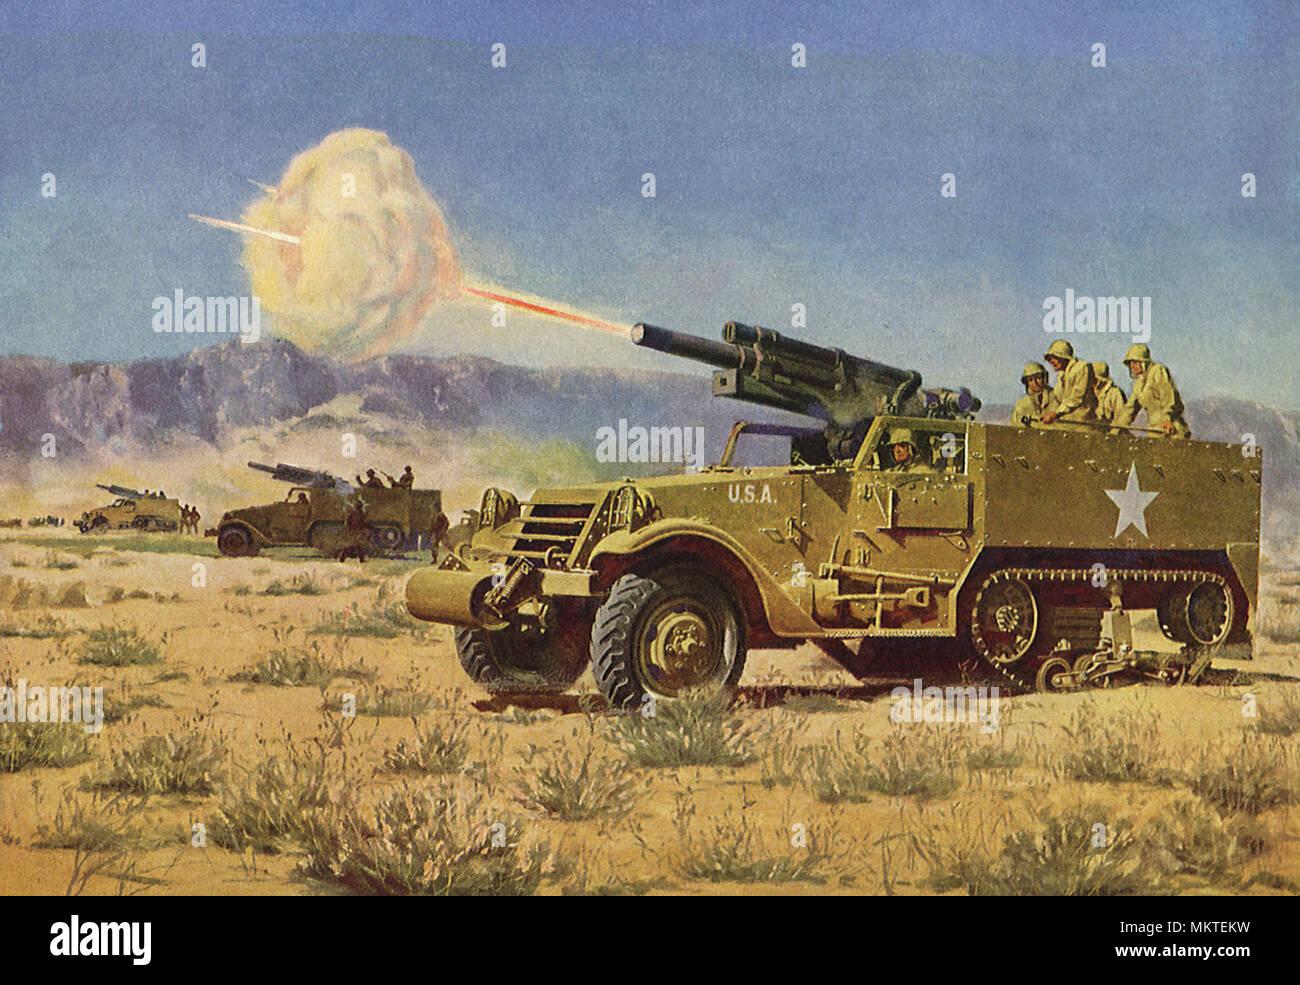 Truck tank shooting artillary gun in the field - Stock Image